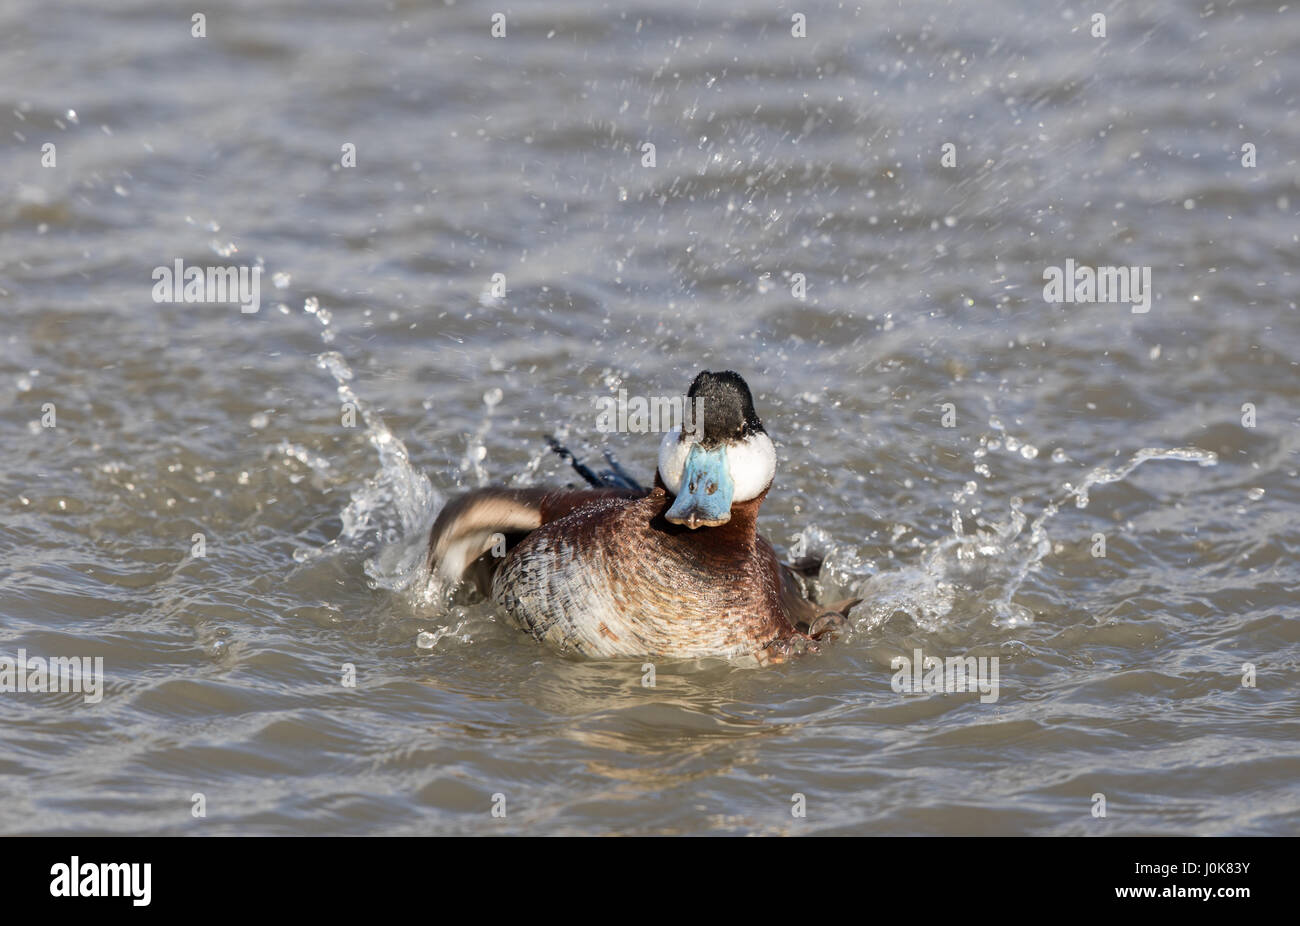 North American Ducks Stock Photos & North American Ducks ...